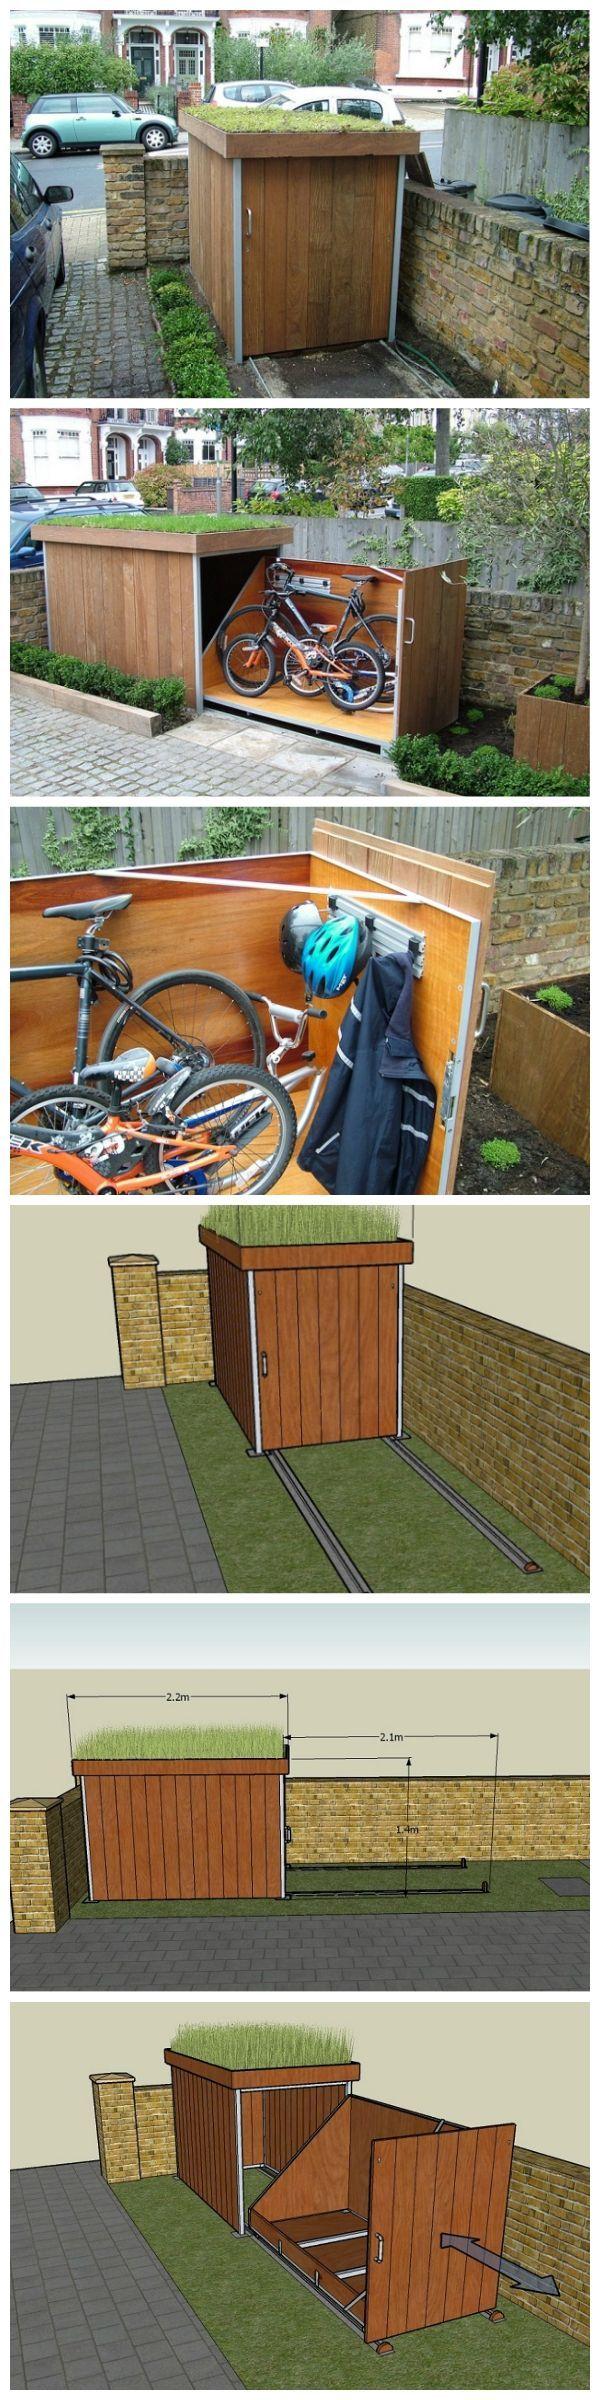 How To Build A Bike Storage Shed